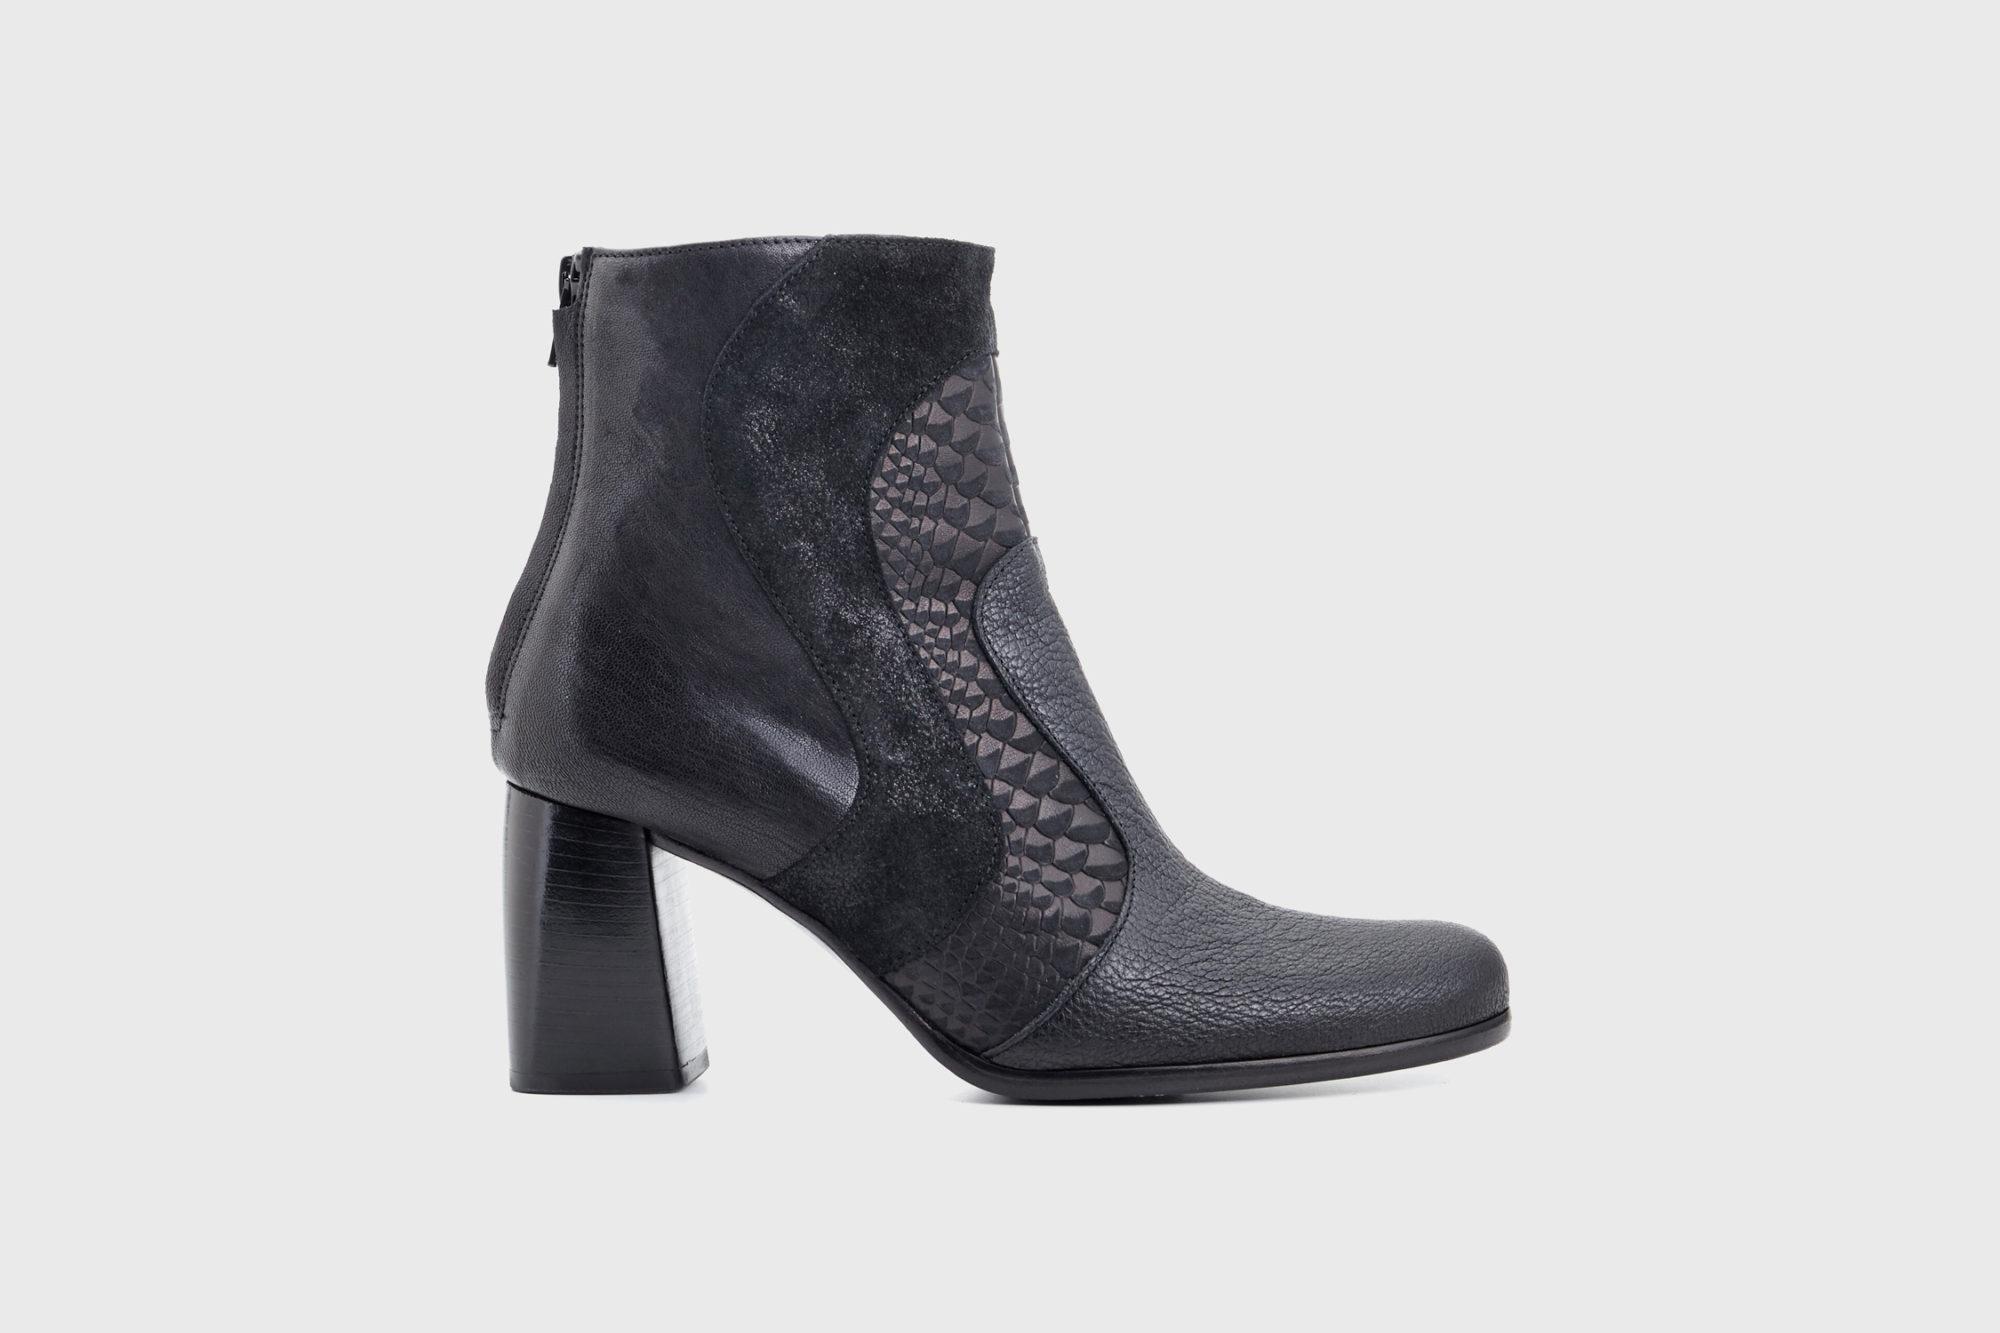 Dorotea botín de tacón alto Joy color negro fw17 perfil